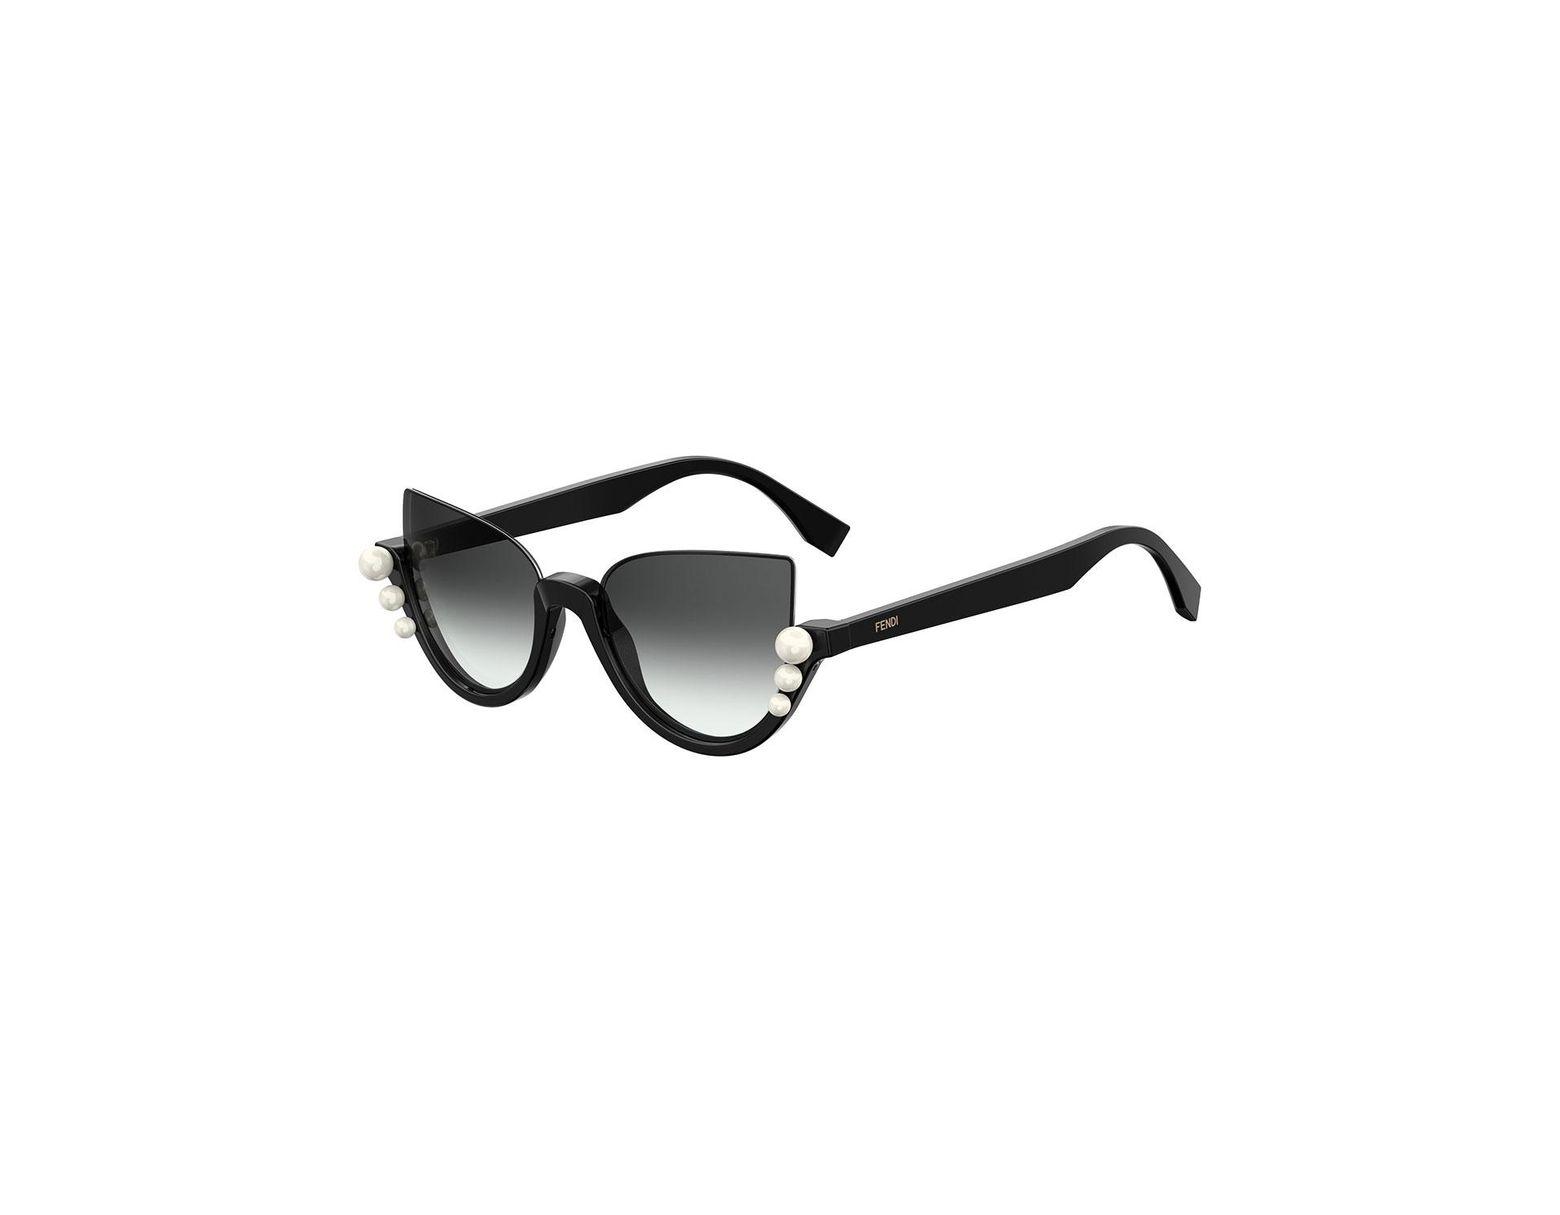 283a5b9c82044 Fendi Blink Half-rim Pearl Cat-eye Sunglasses in Black - Lyst